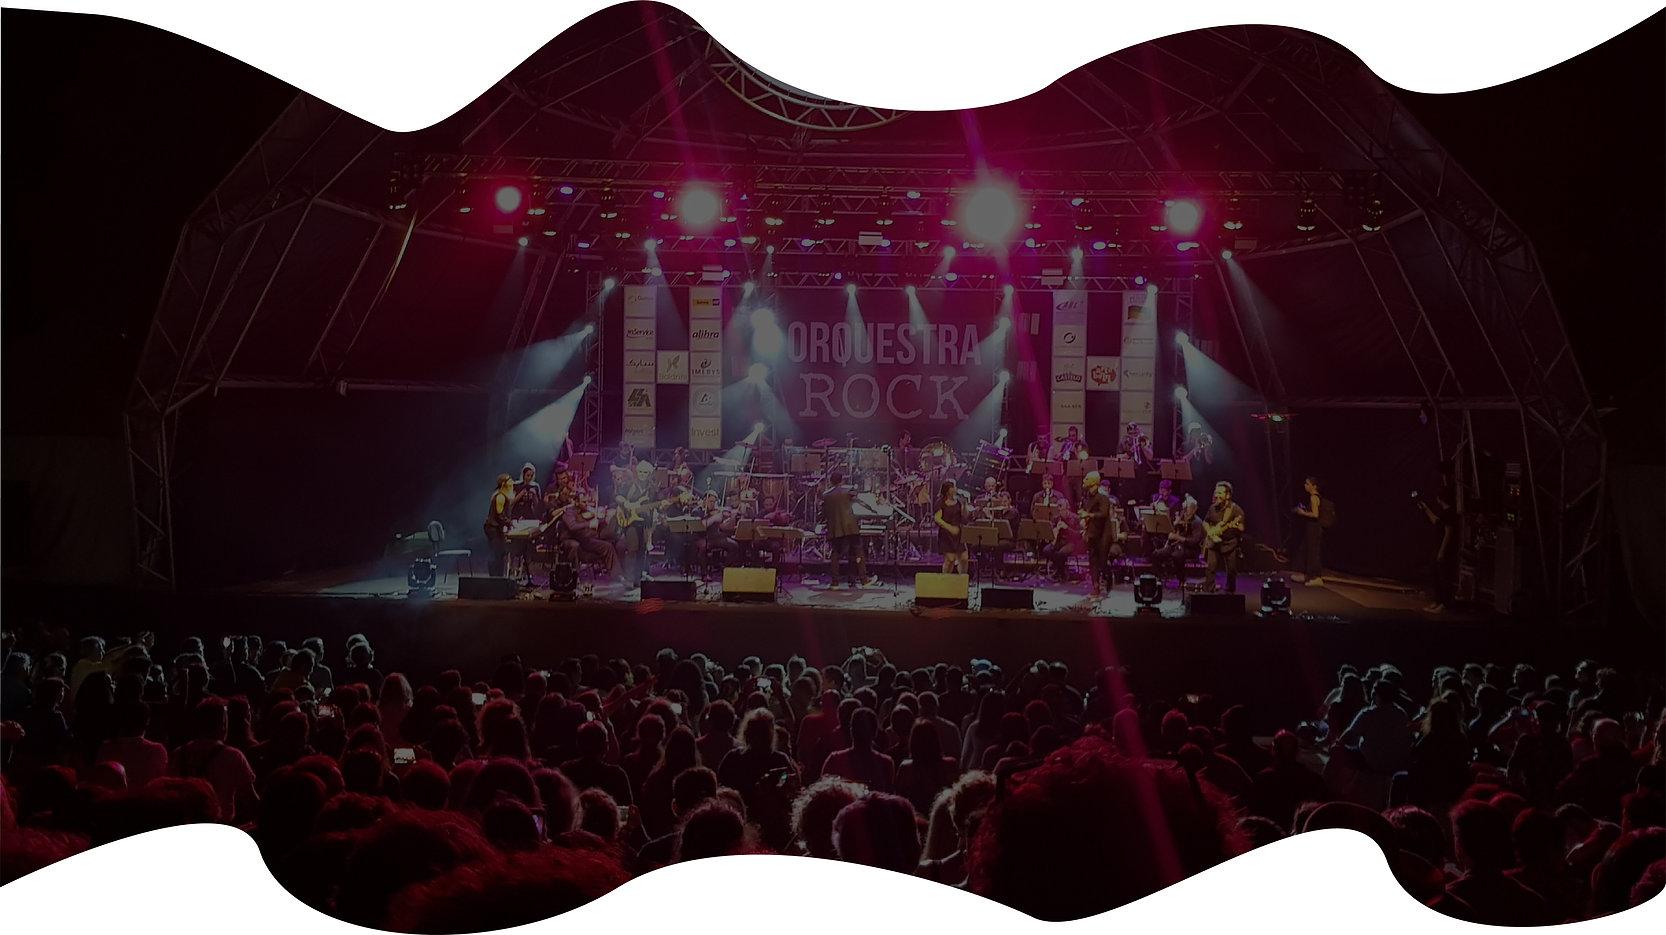 orquestra rock show.jpg